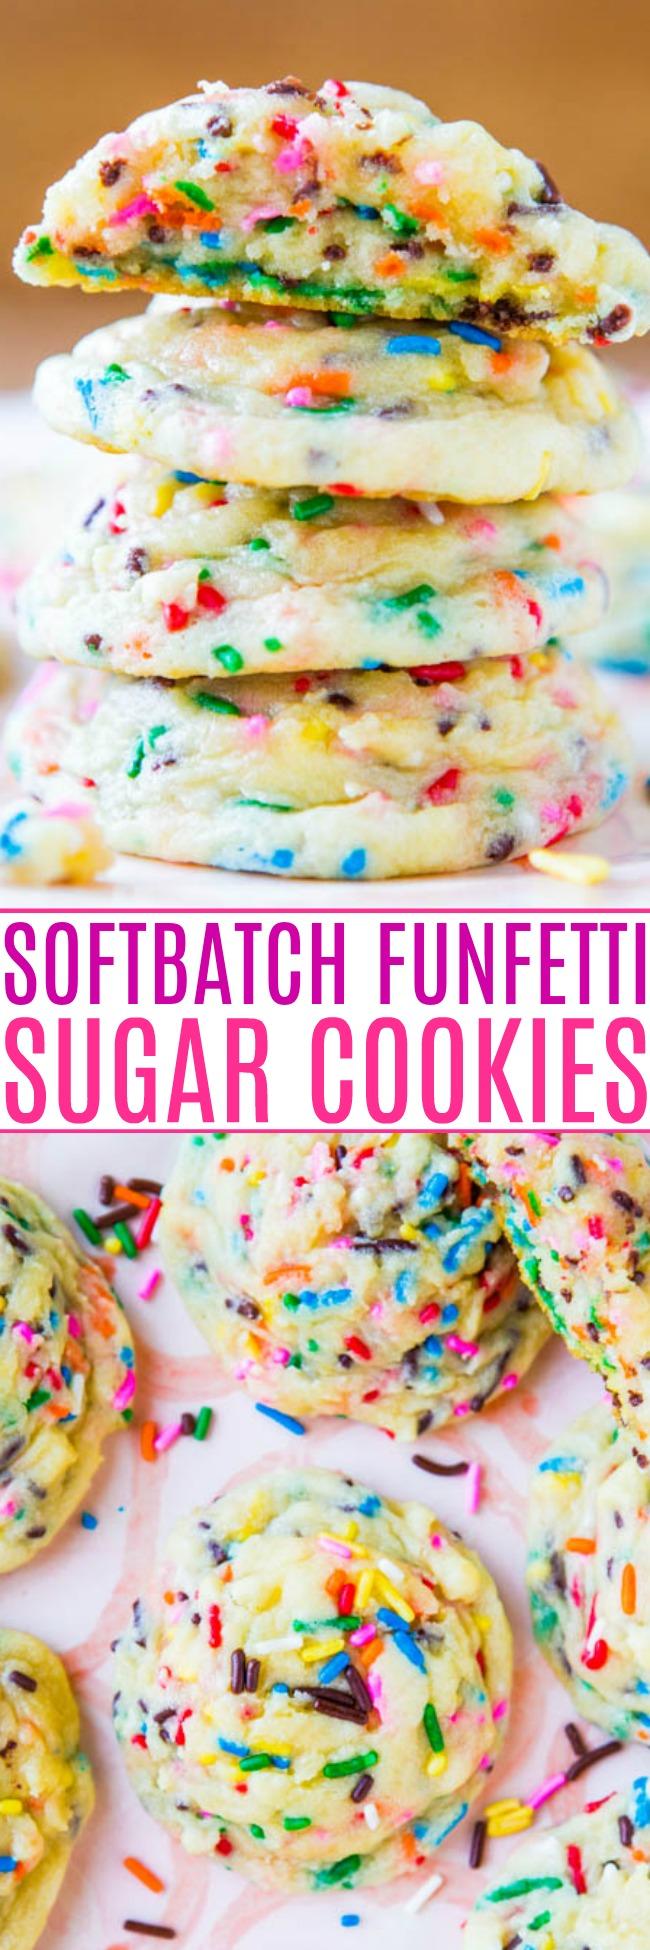 https://www.averiecooks.com/softbatch-funfetti-sugar-cookies/